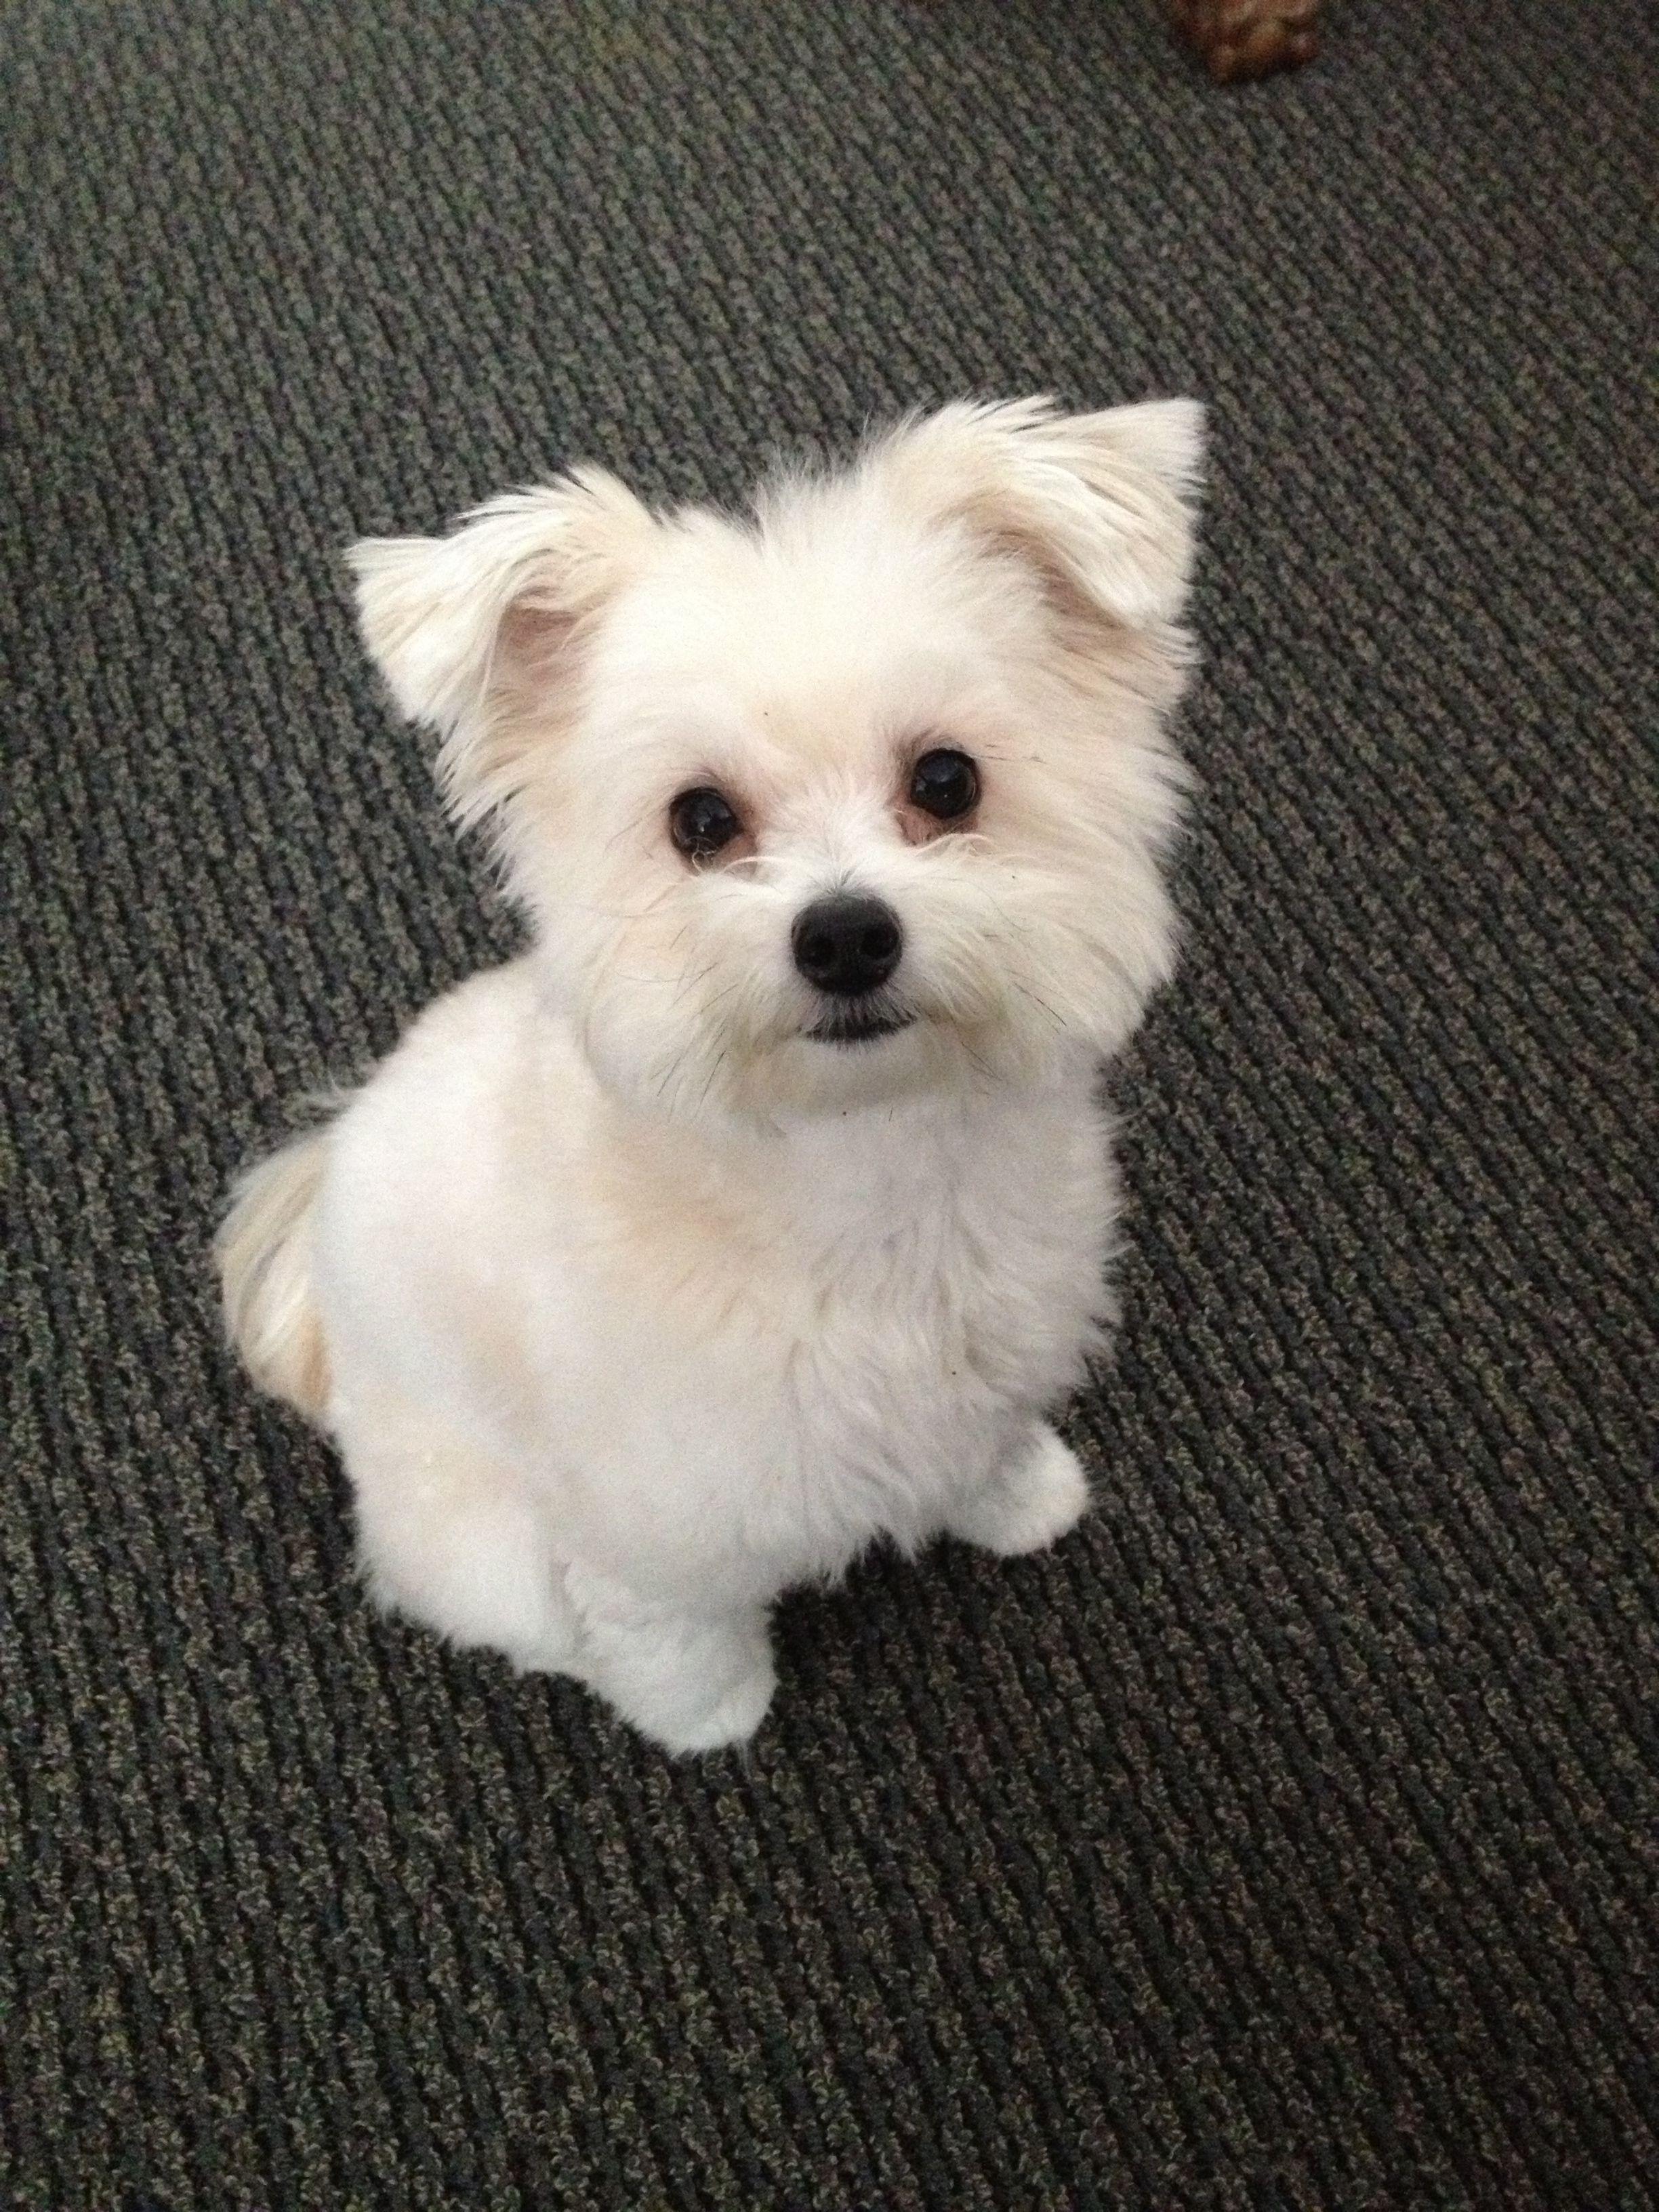 Pomapoo | Pet dogs puppies, Cute animals, Puppy breath